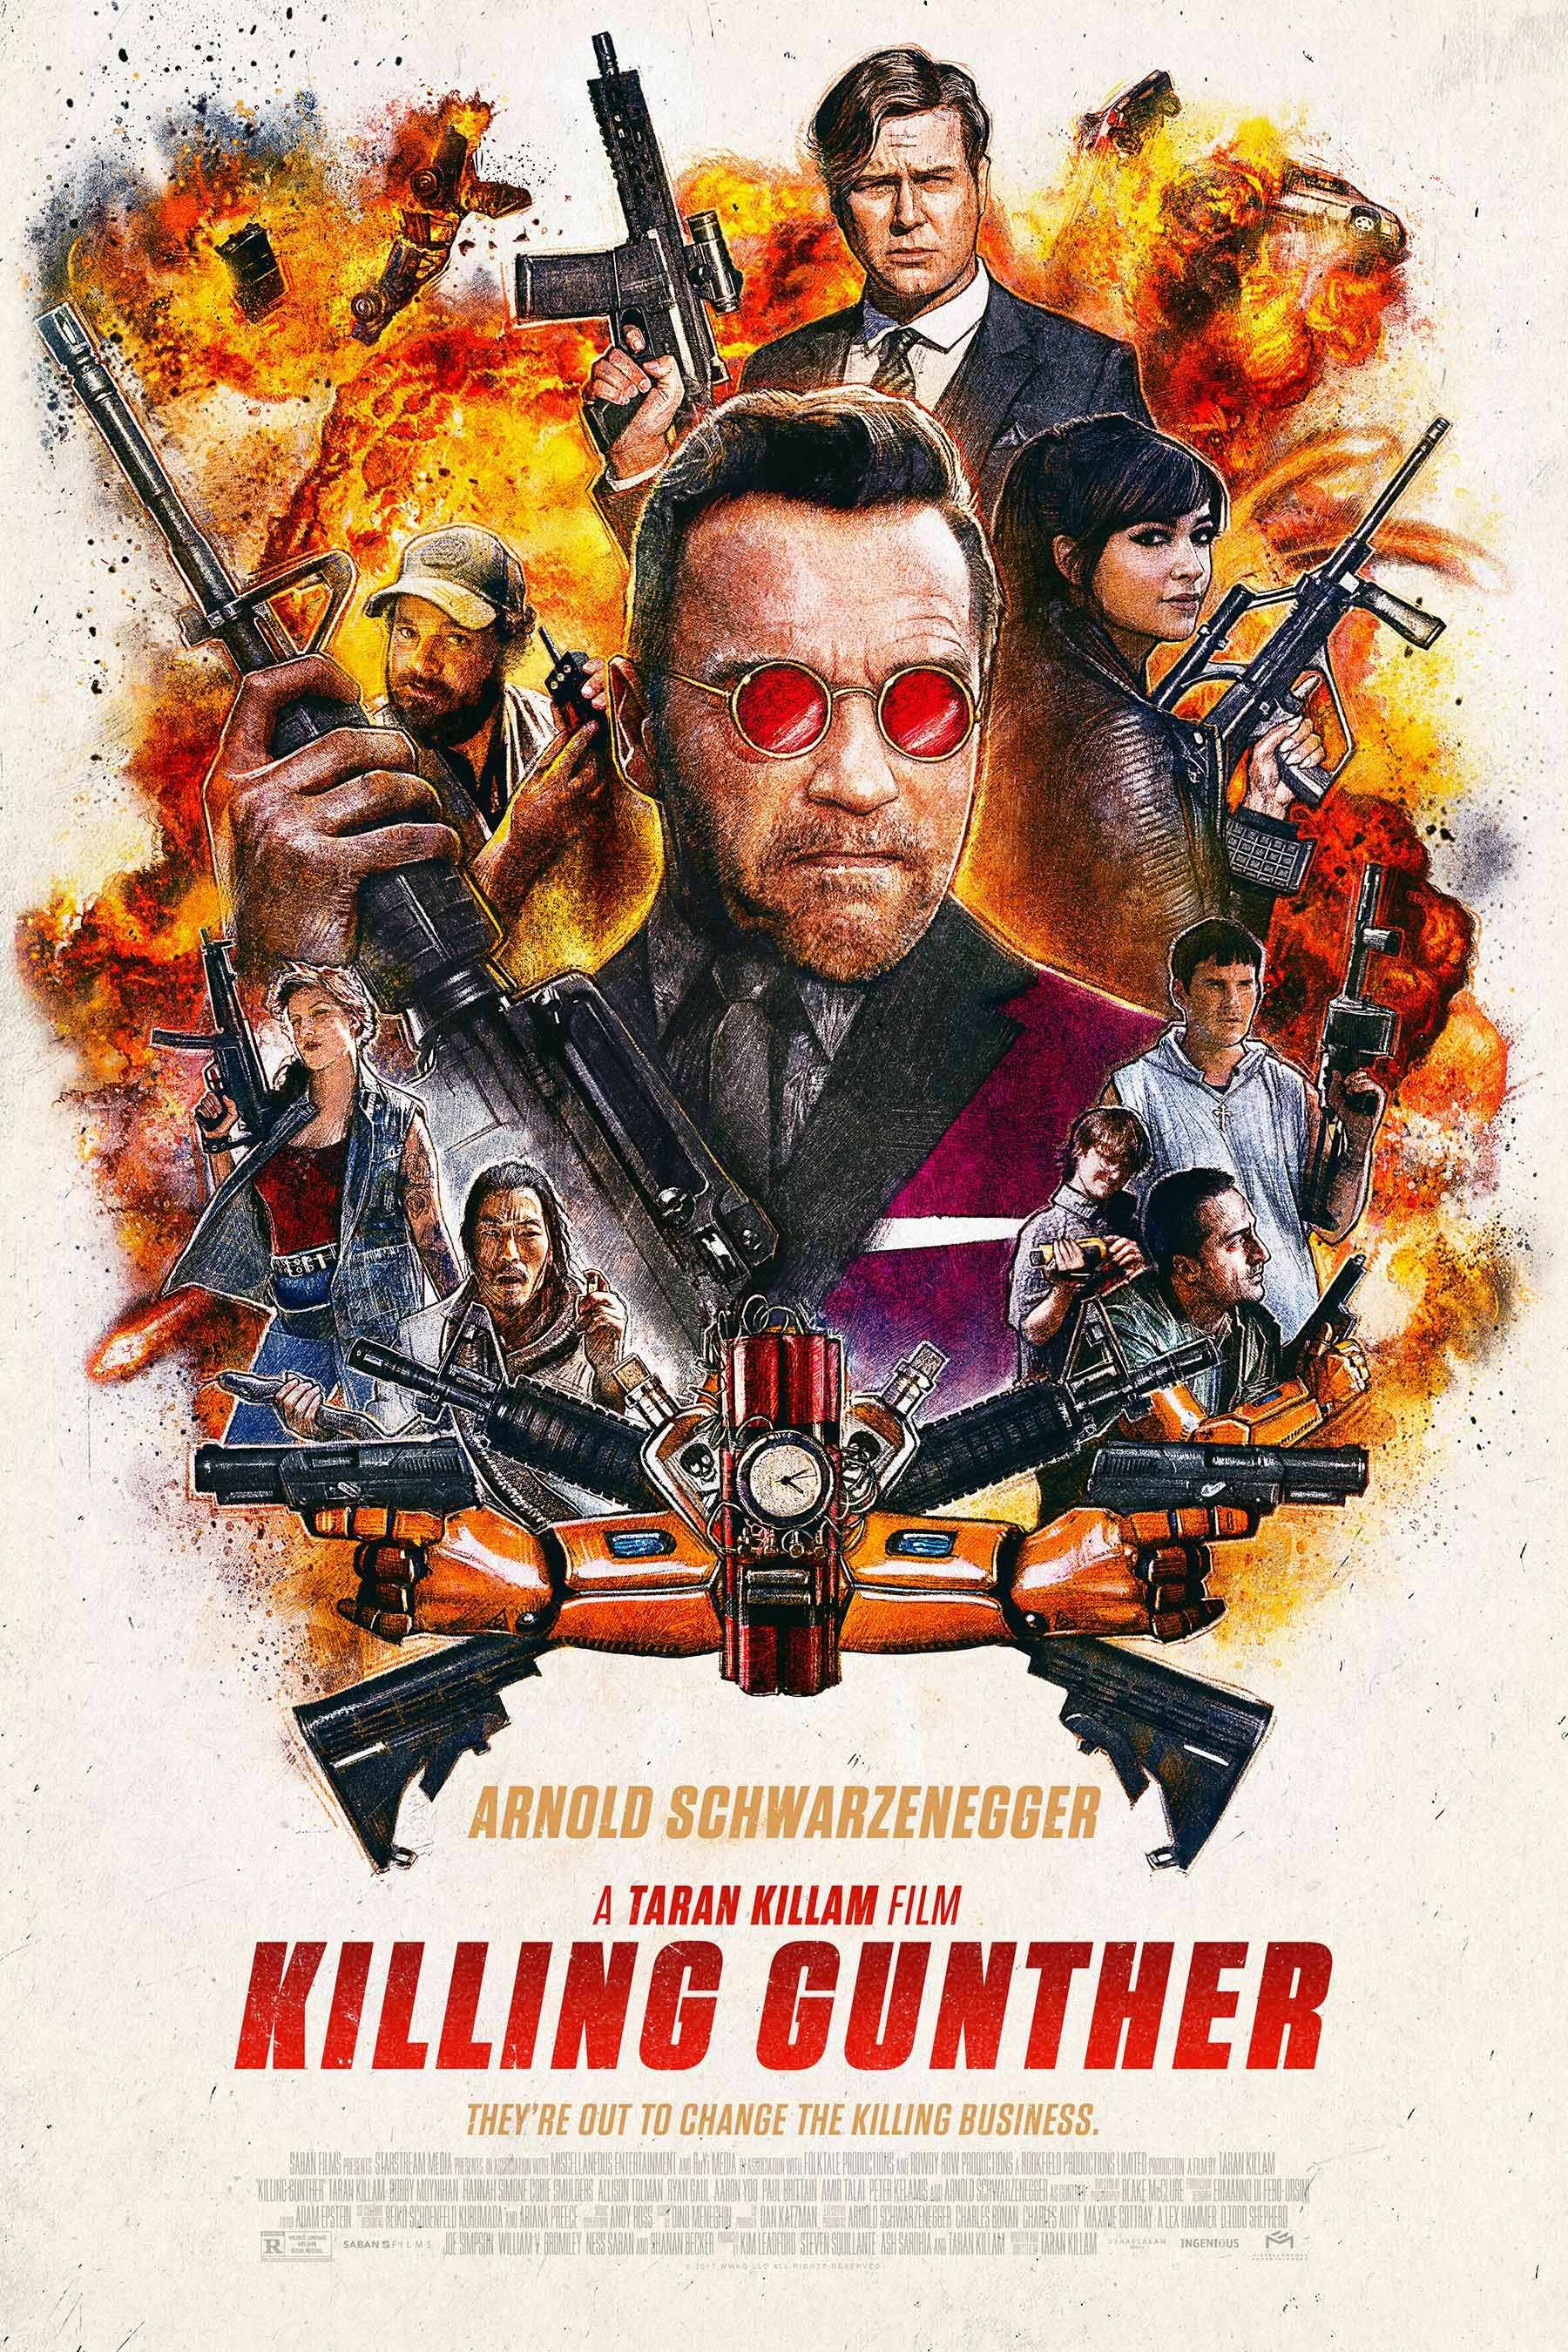 killing-gunther-theatrical-poster.jpg?token=gZ9qQ4%2B8D3fjaKyyDOpjXlCDOPs%3D